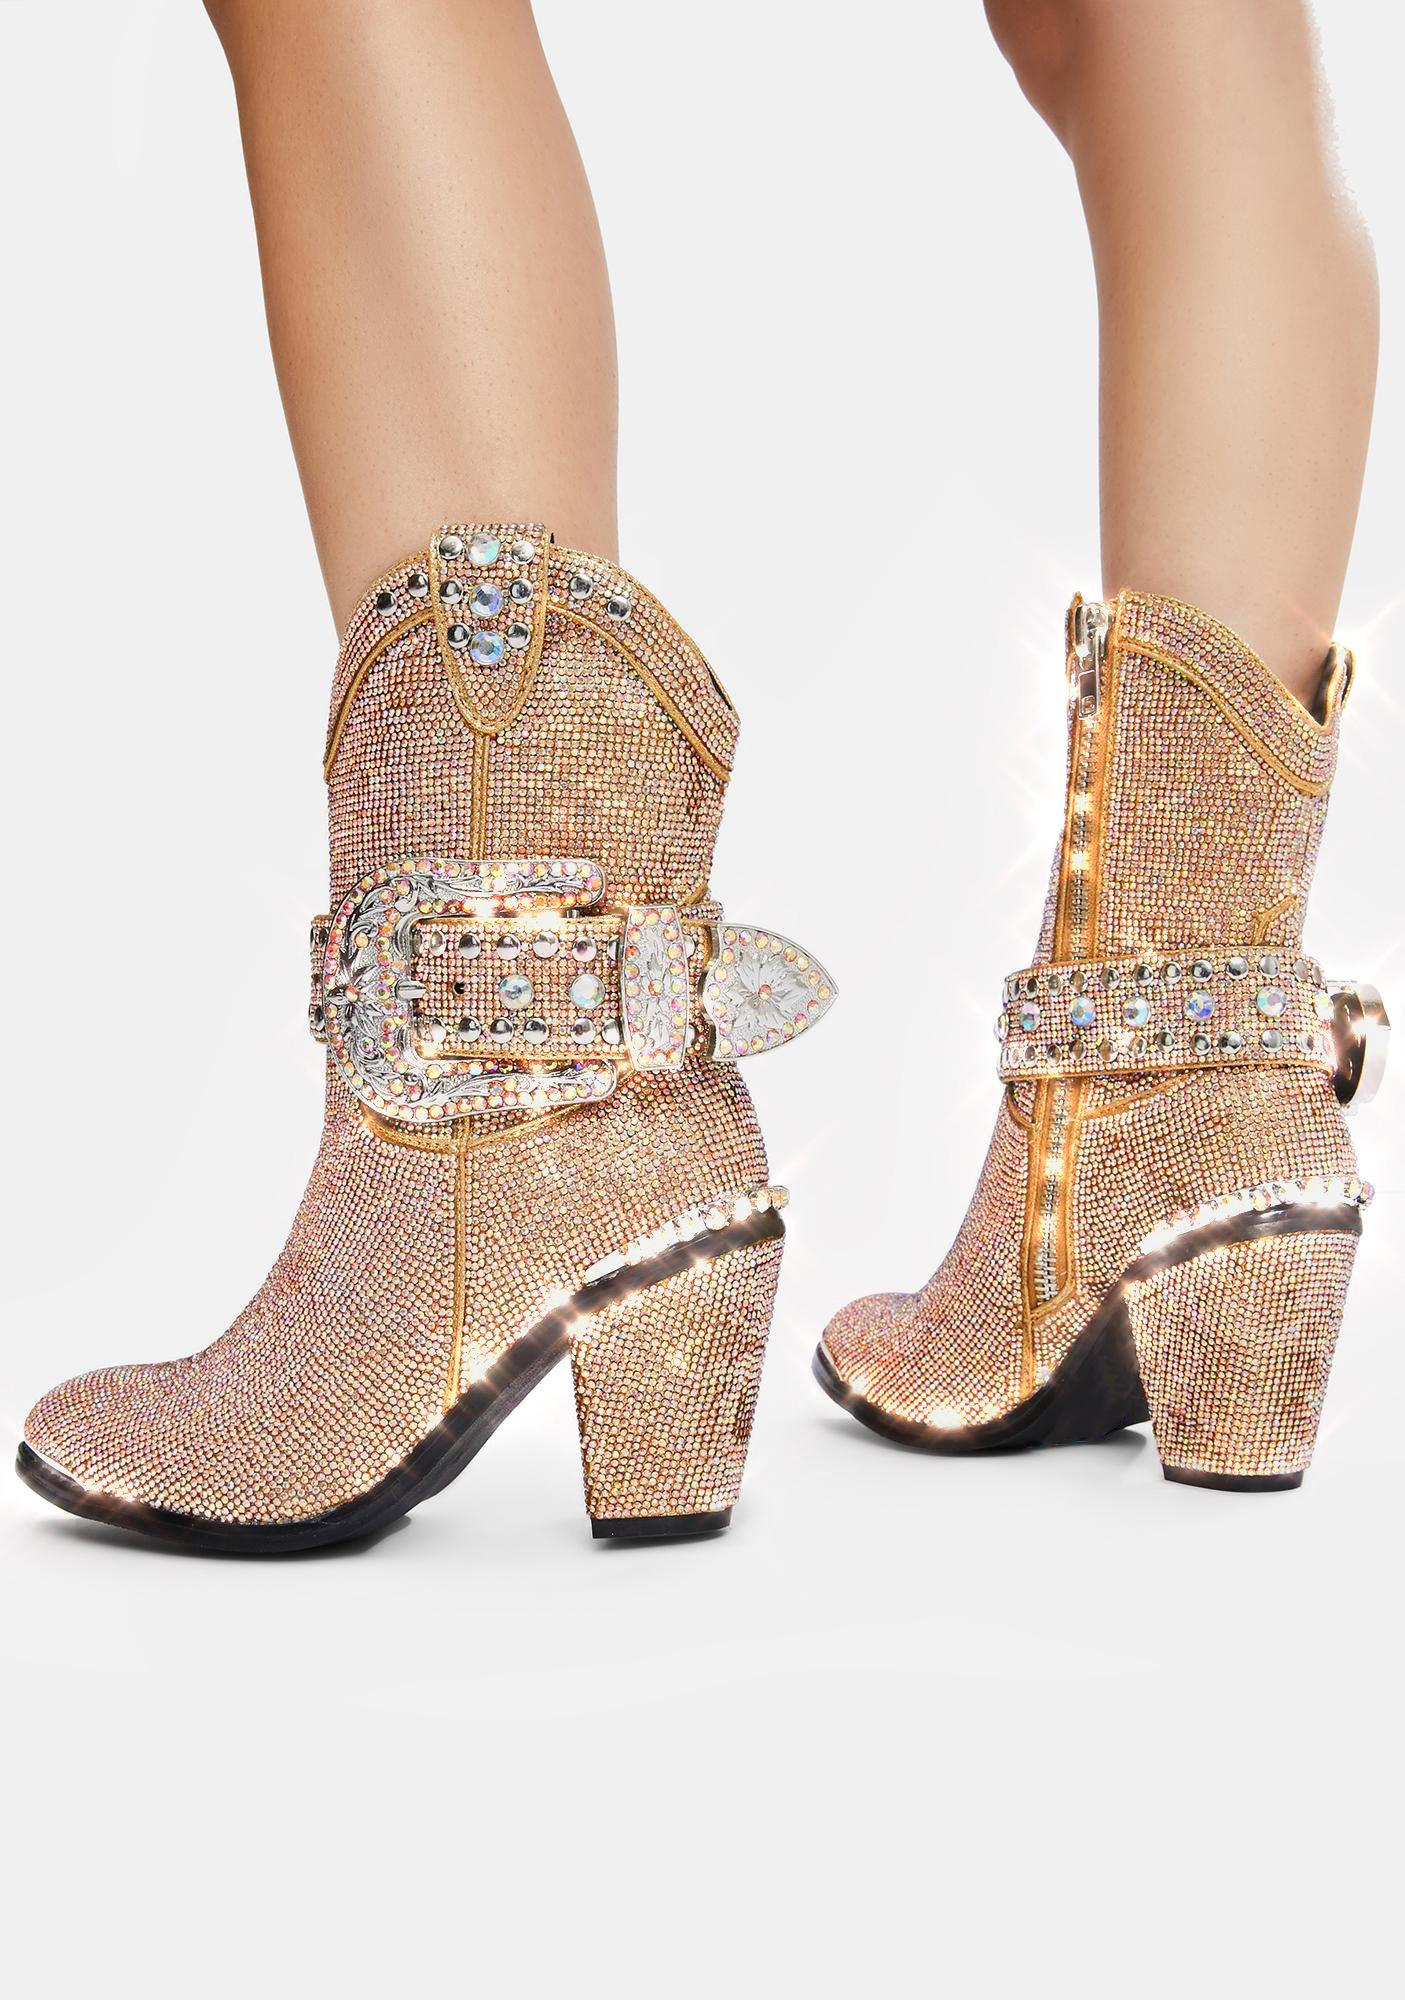 Club Exx Golden Sheriff Shine Cowboy Boots